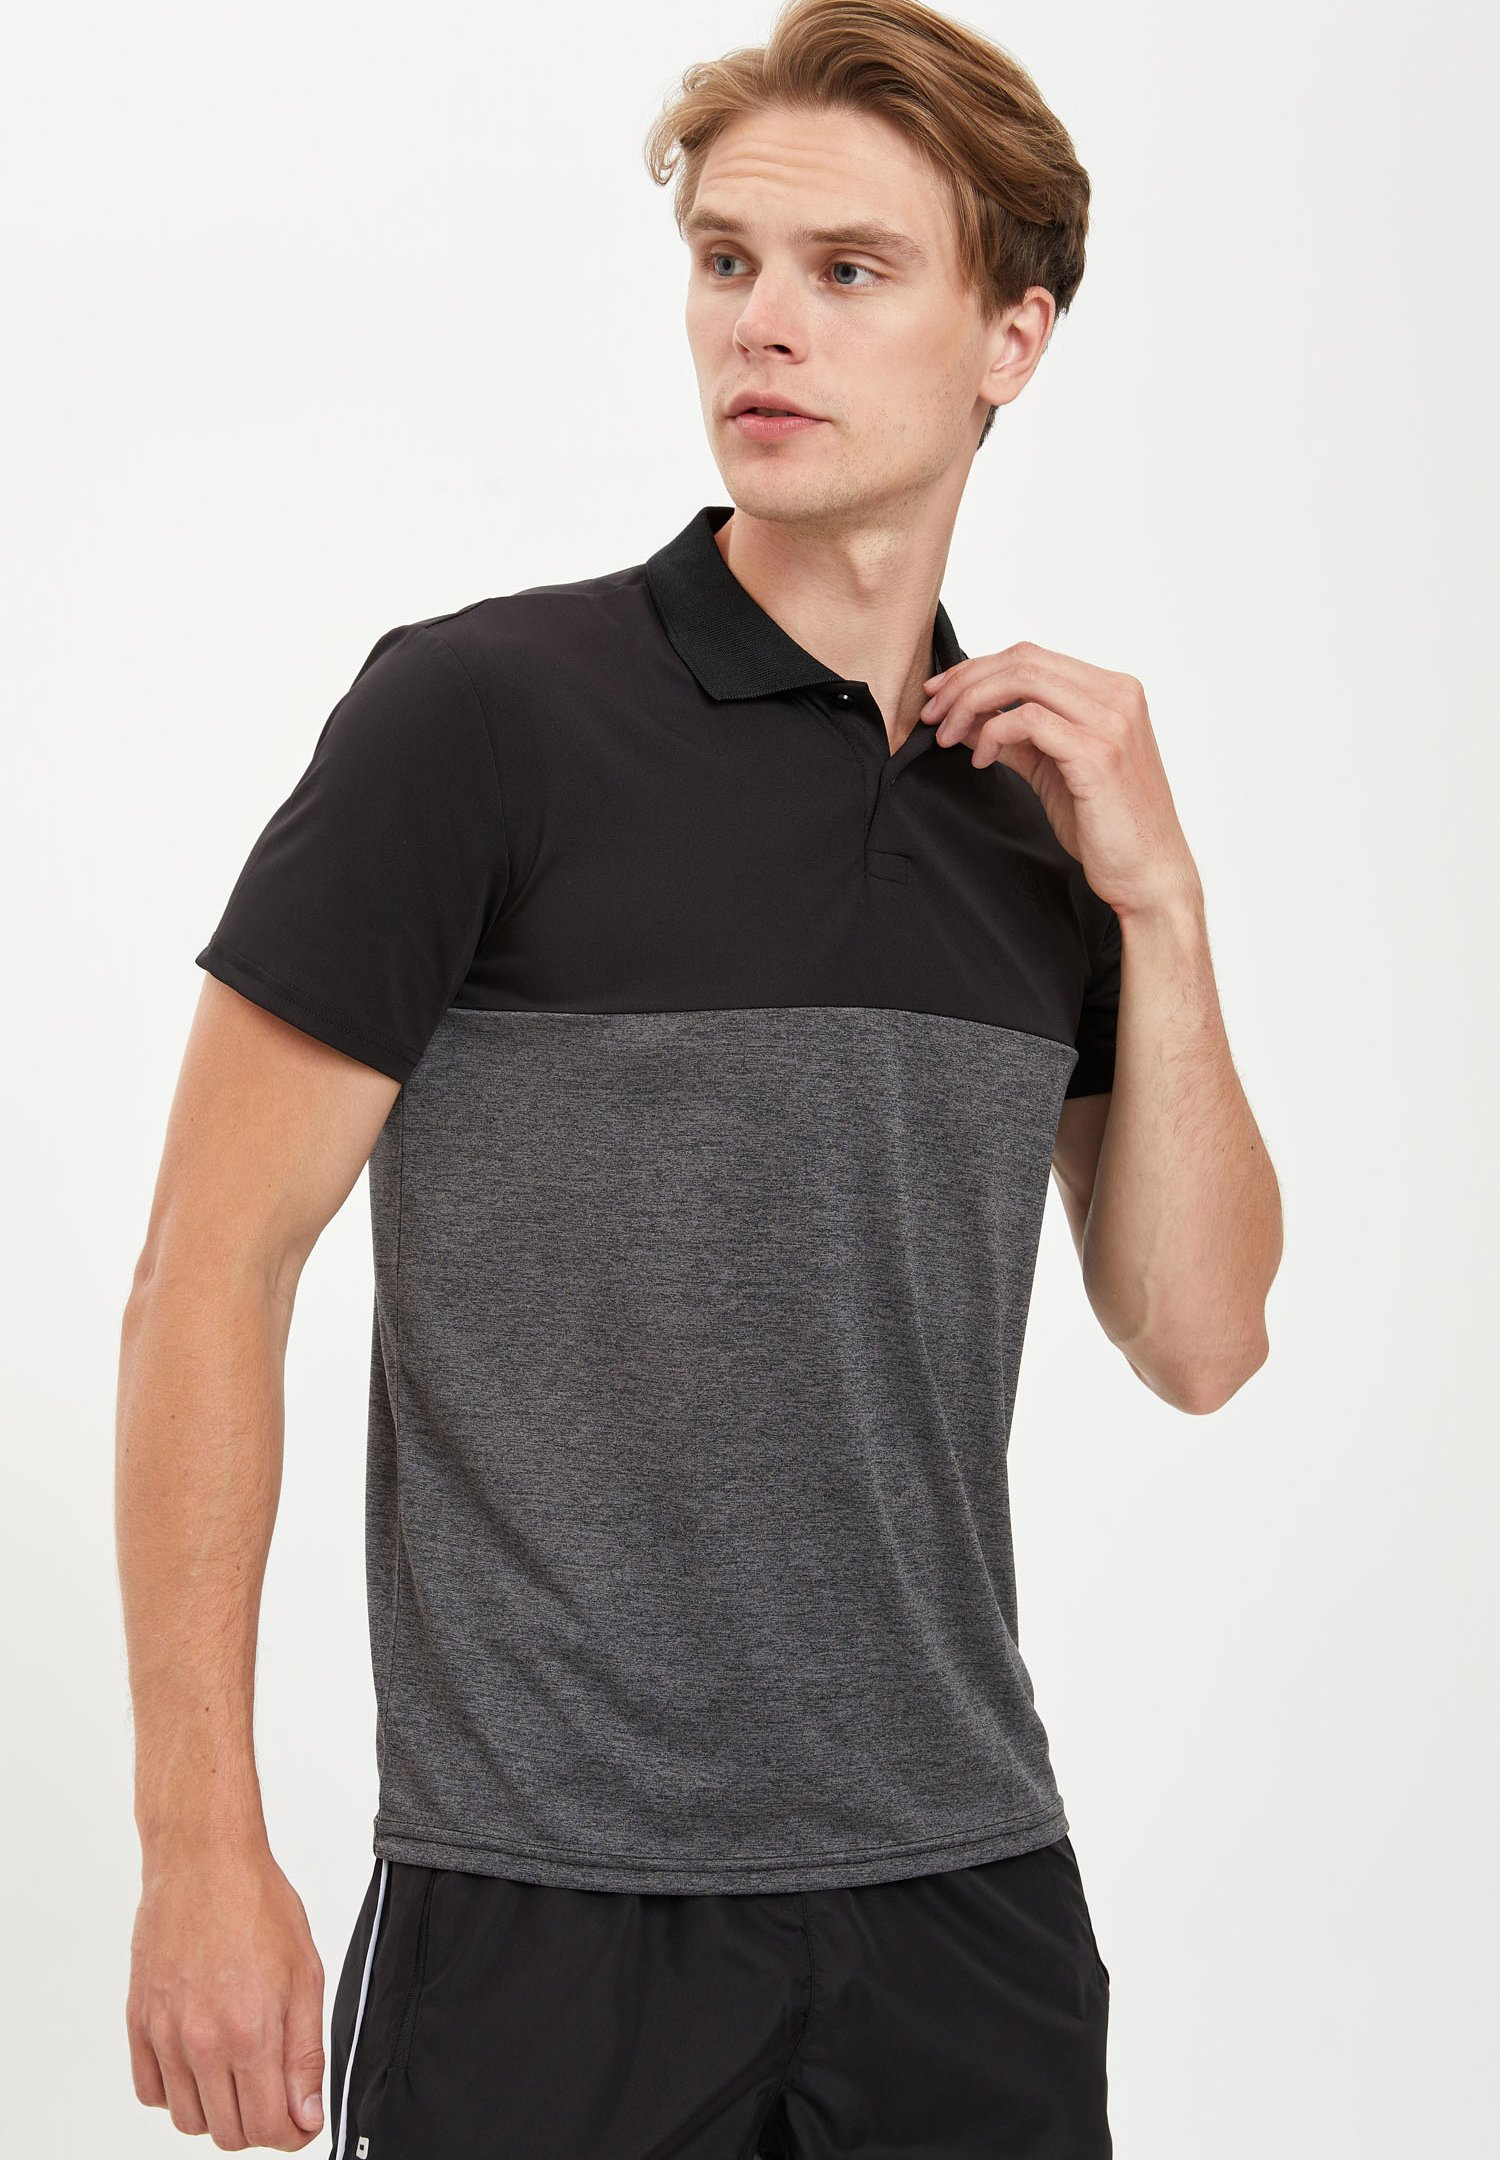 DeFacto Print T-shirt - anthracite 83B1J